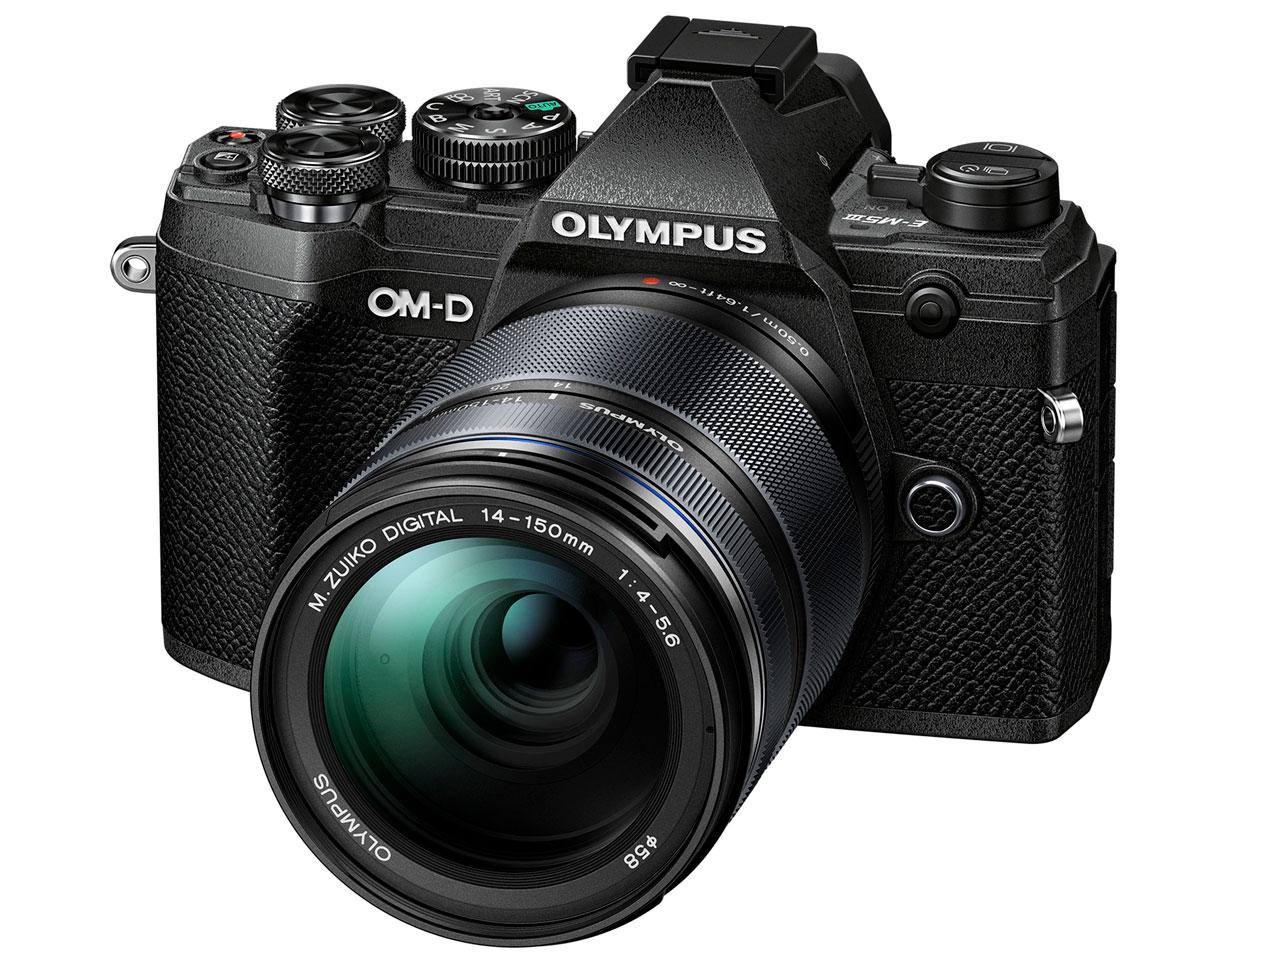 OLYMPUS オリンパス OM-D E-M5 Mark III 14-150mmII レンズキット(ブラック)